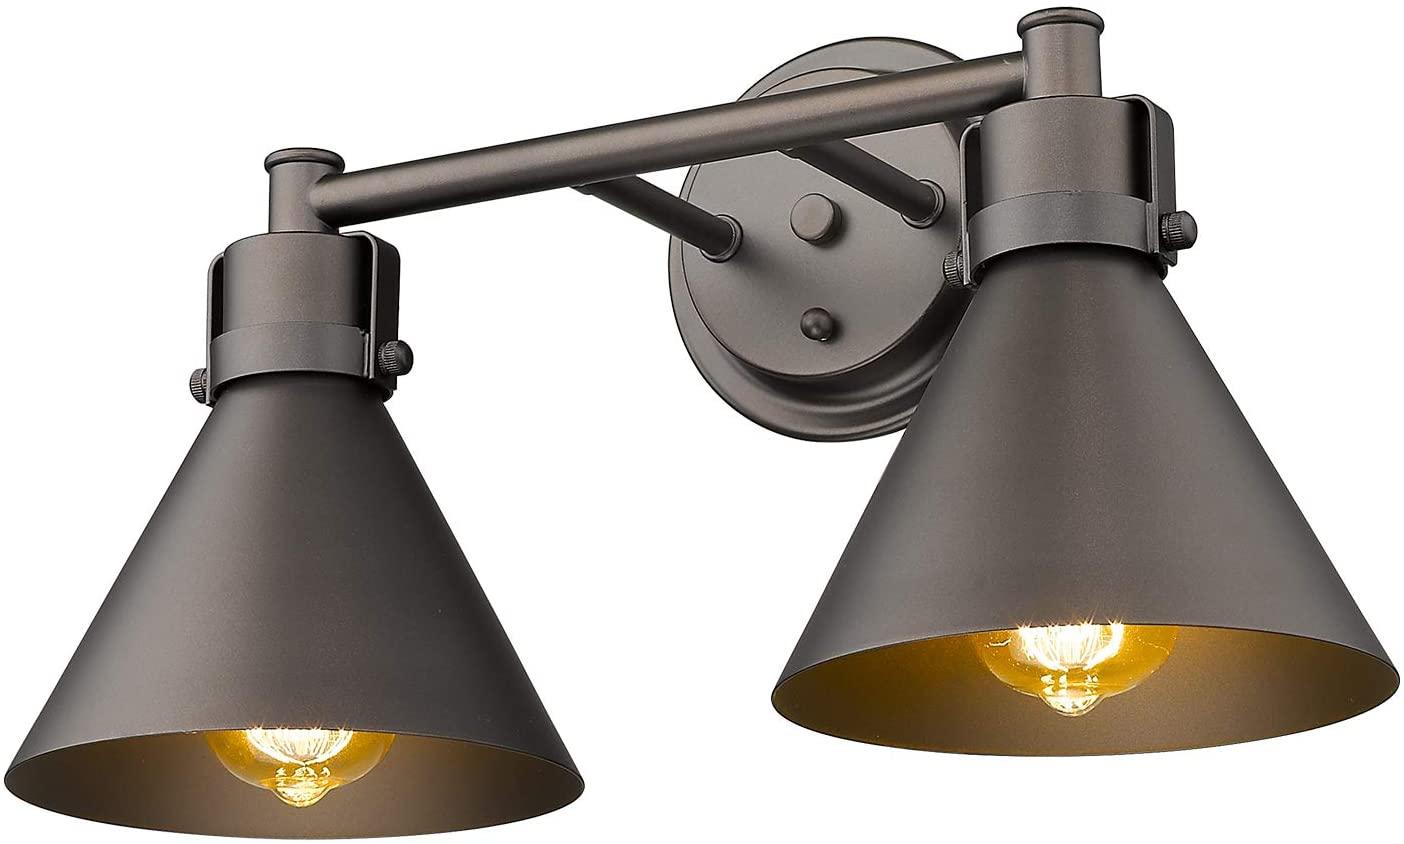 Zeyu Vanity Lights for Bathroom 2-Light, Industrial Bathroom Lighting in Oil Rubbed Bronze Finish, ZY26-2W ORB